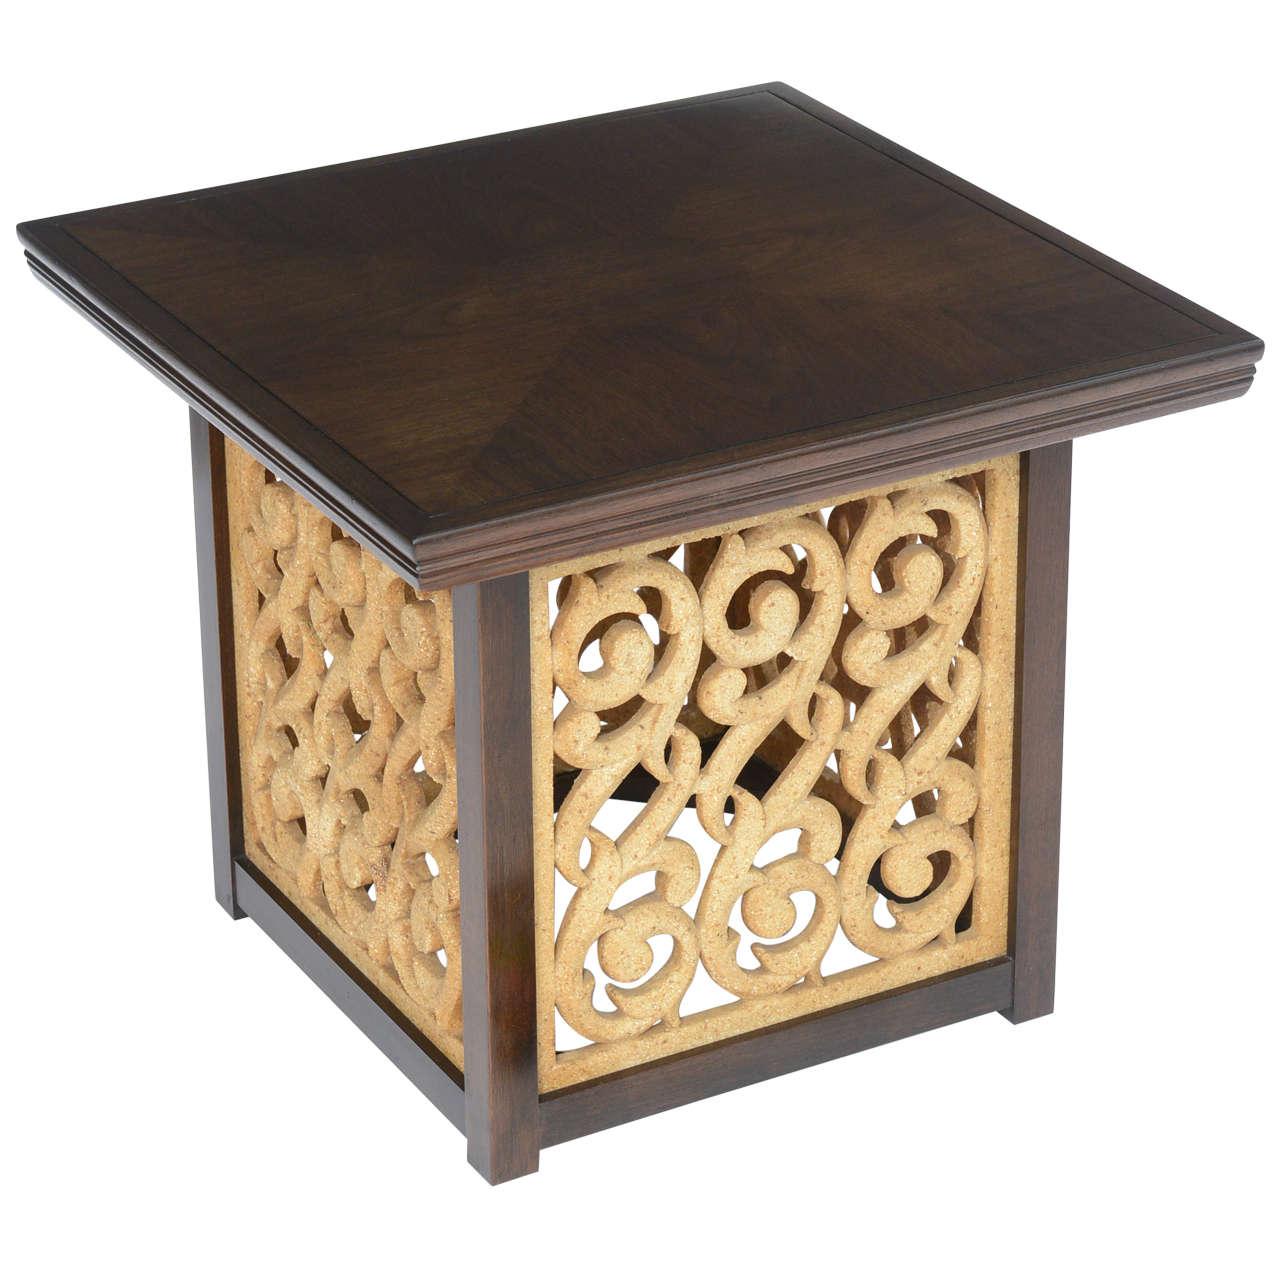 Elegant Detailed Widdicomb Side Table in Walnut